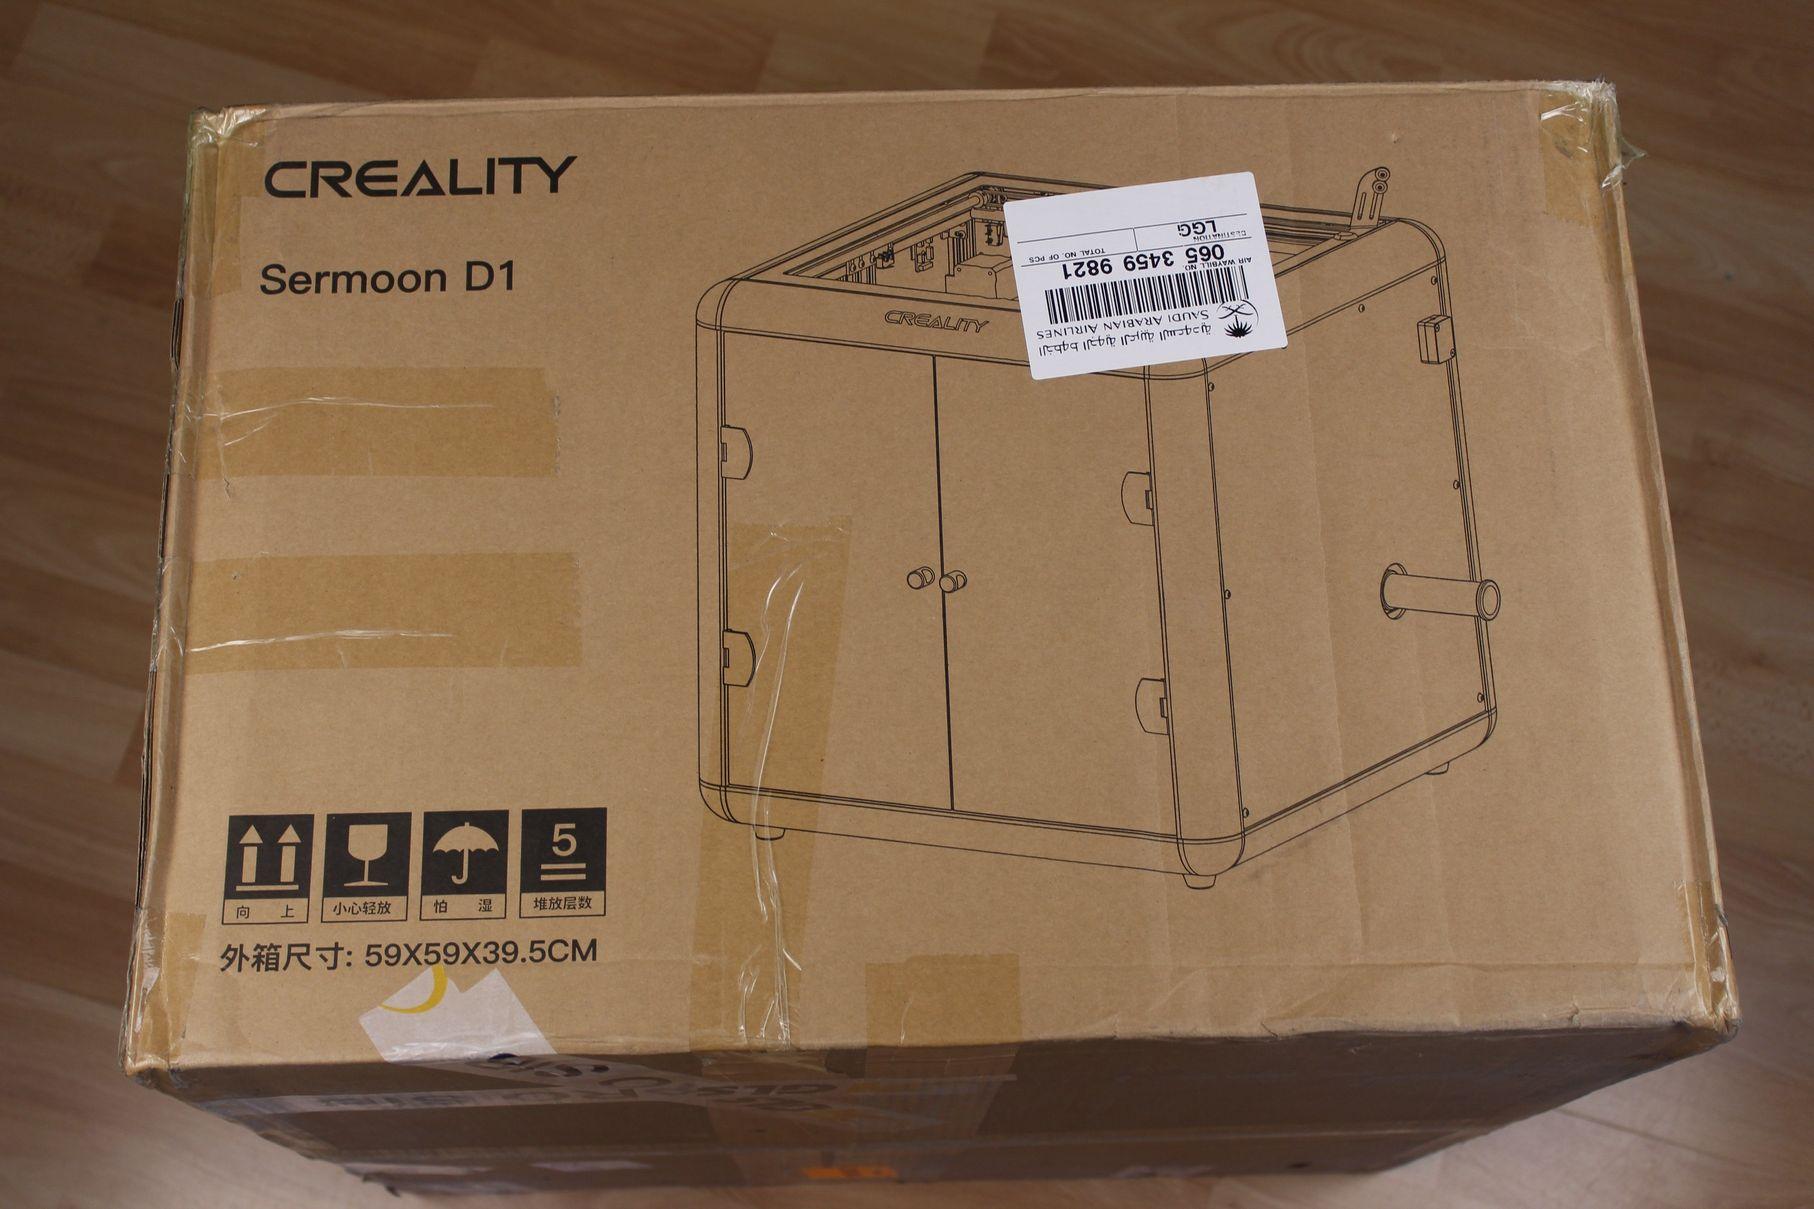 Creality-Sermoon-D1-Packaging-2